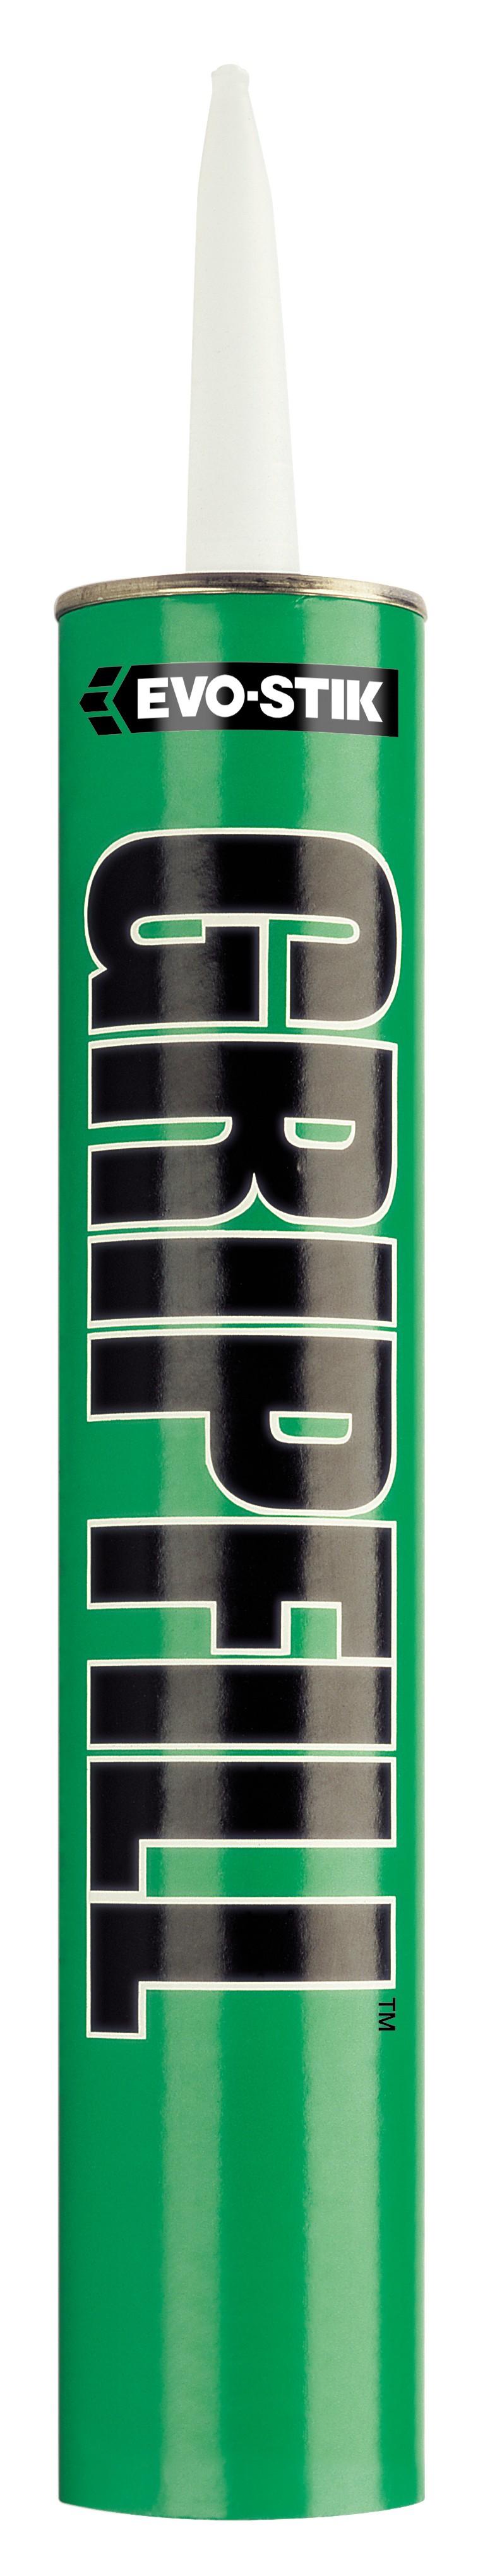 Gripfill C30 Cartridge - Copy.jpg